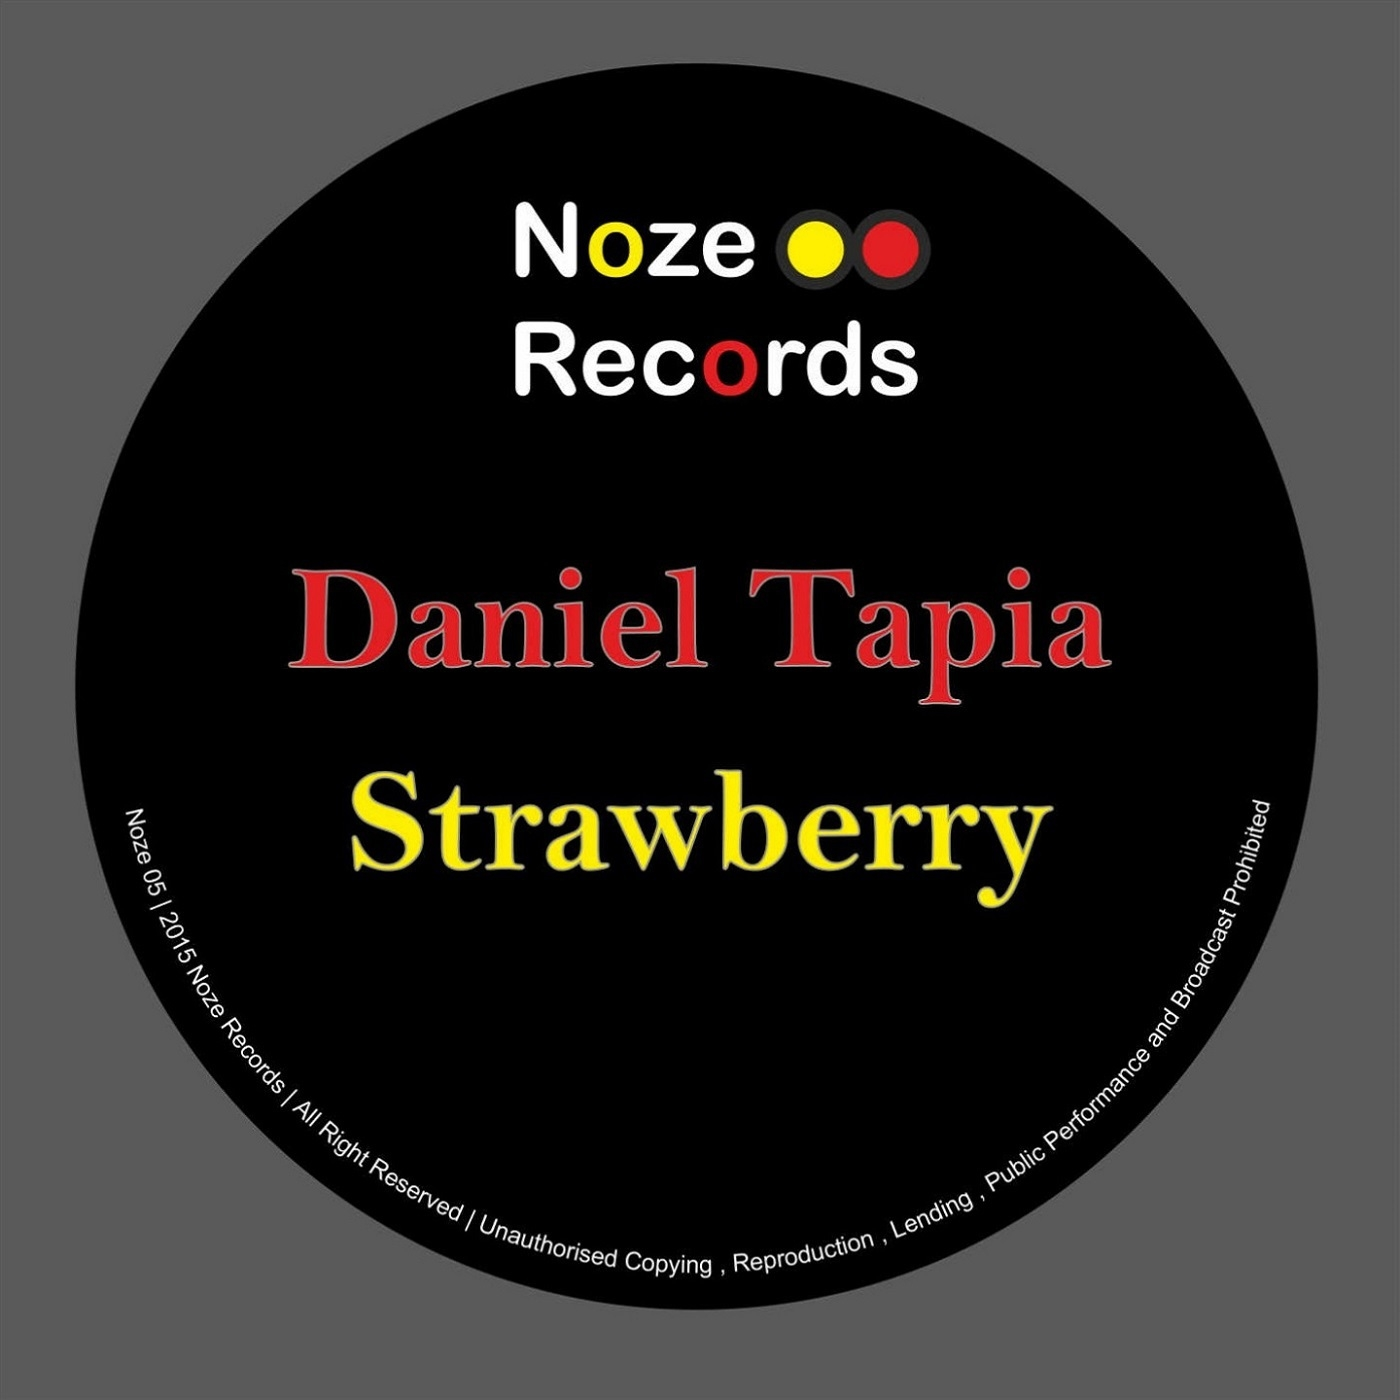 Daniel Tapia - Strawberry (Original mix)